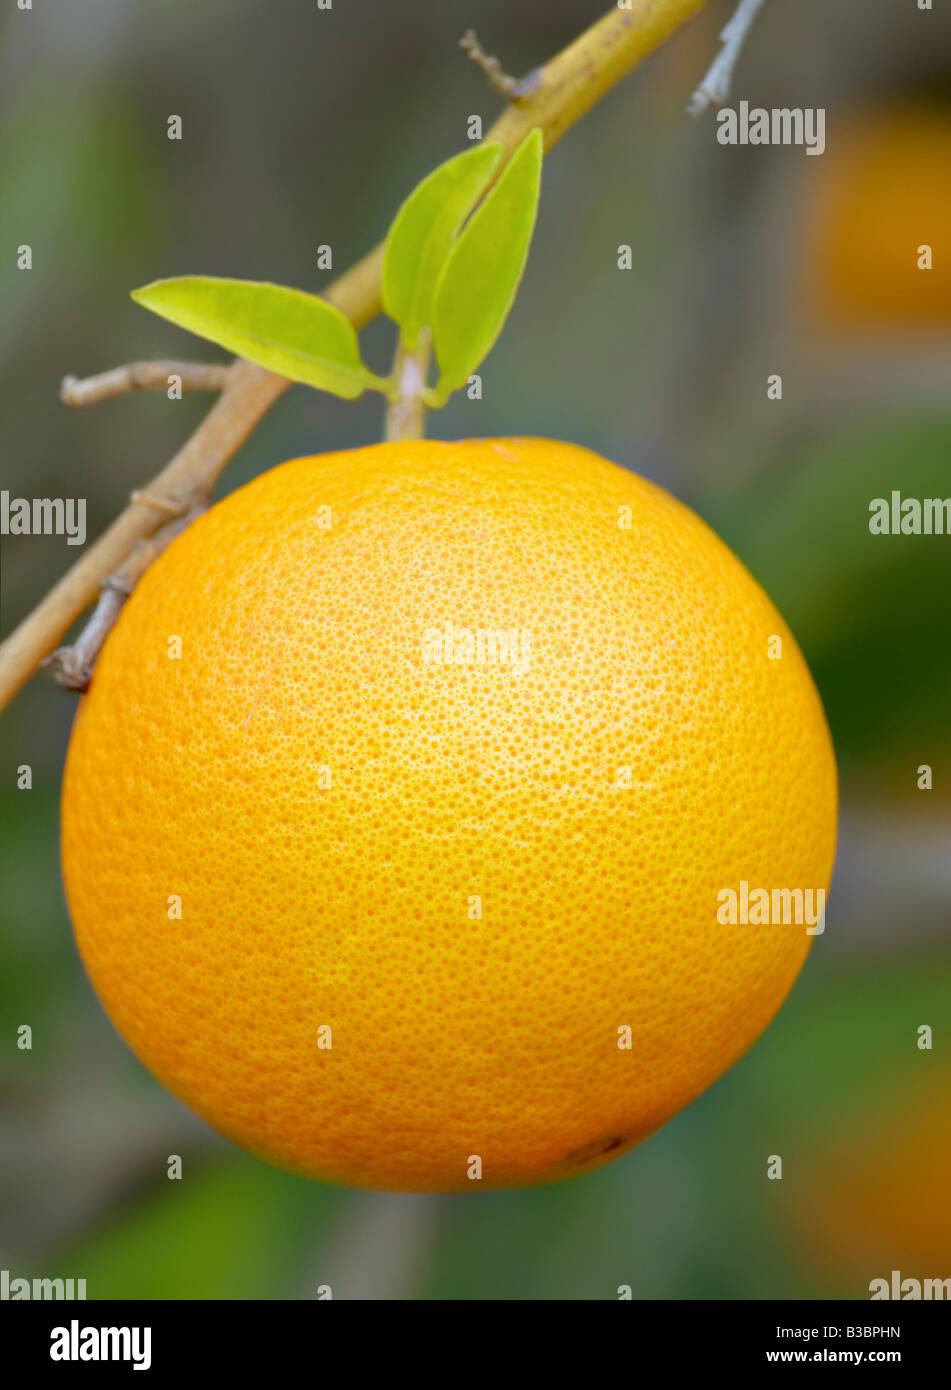 great image of juicy orange on a tree or bush Stock Photo